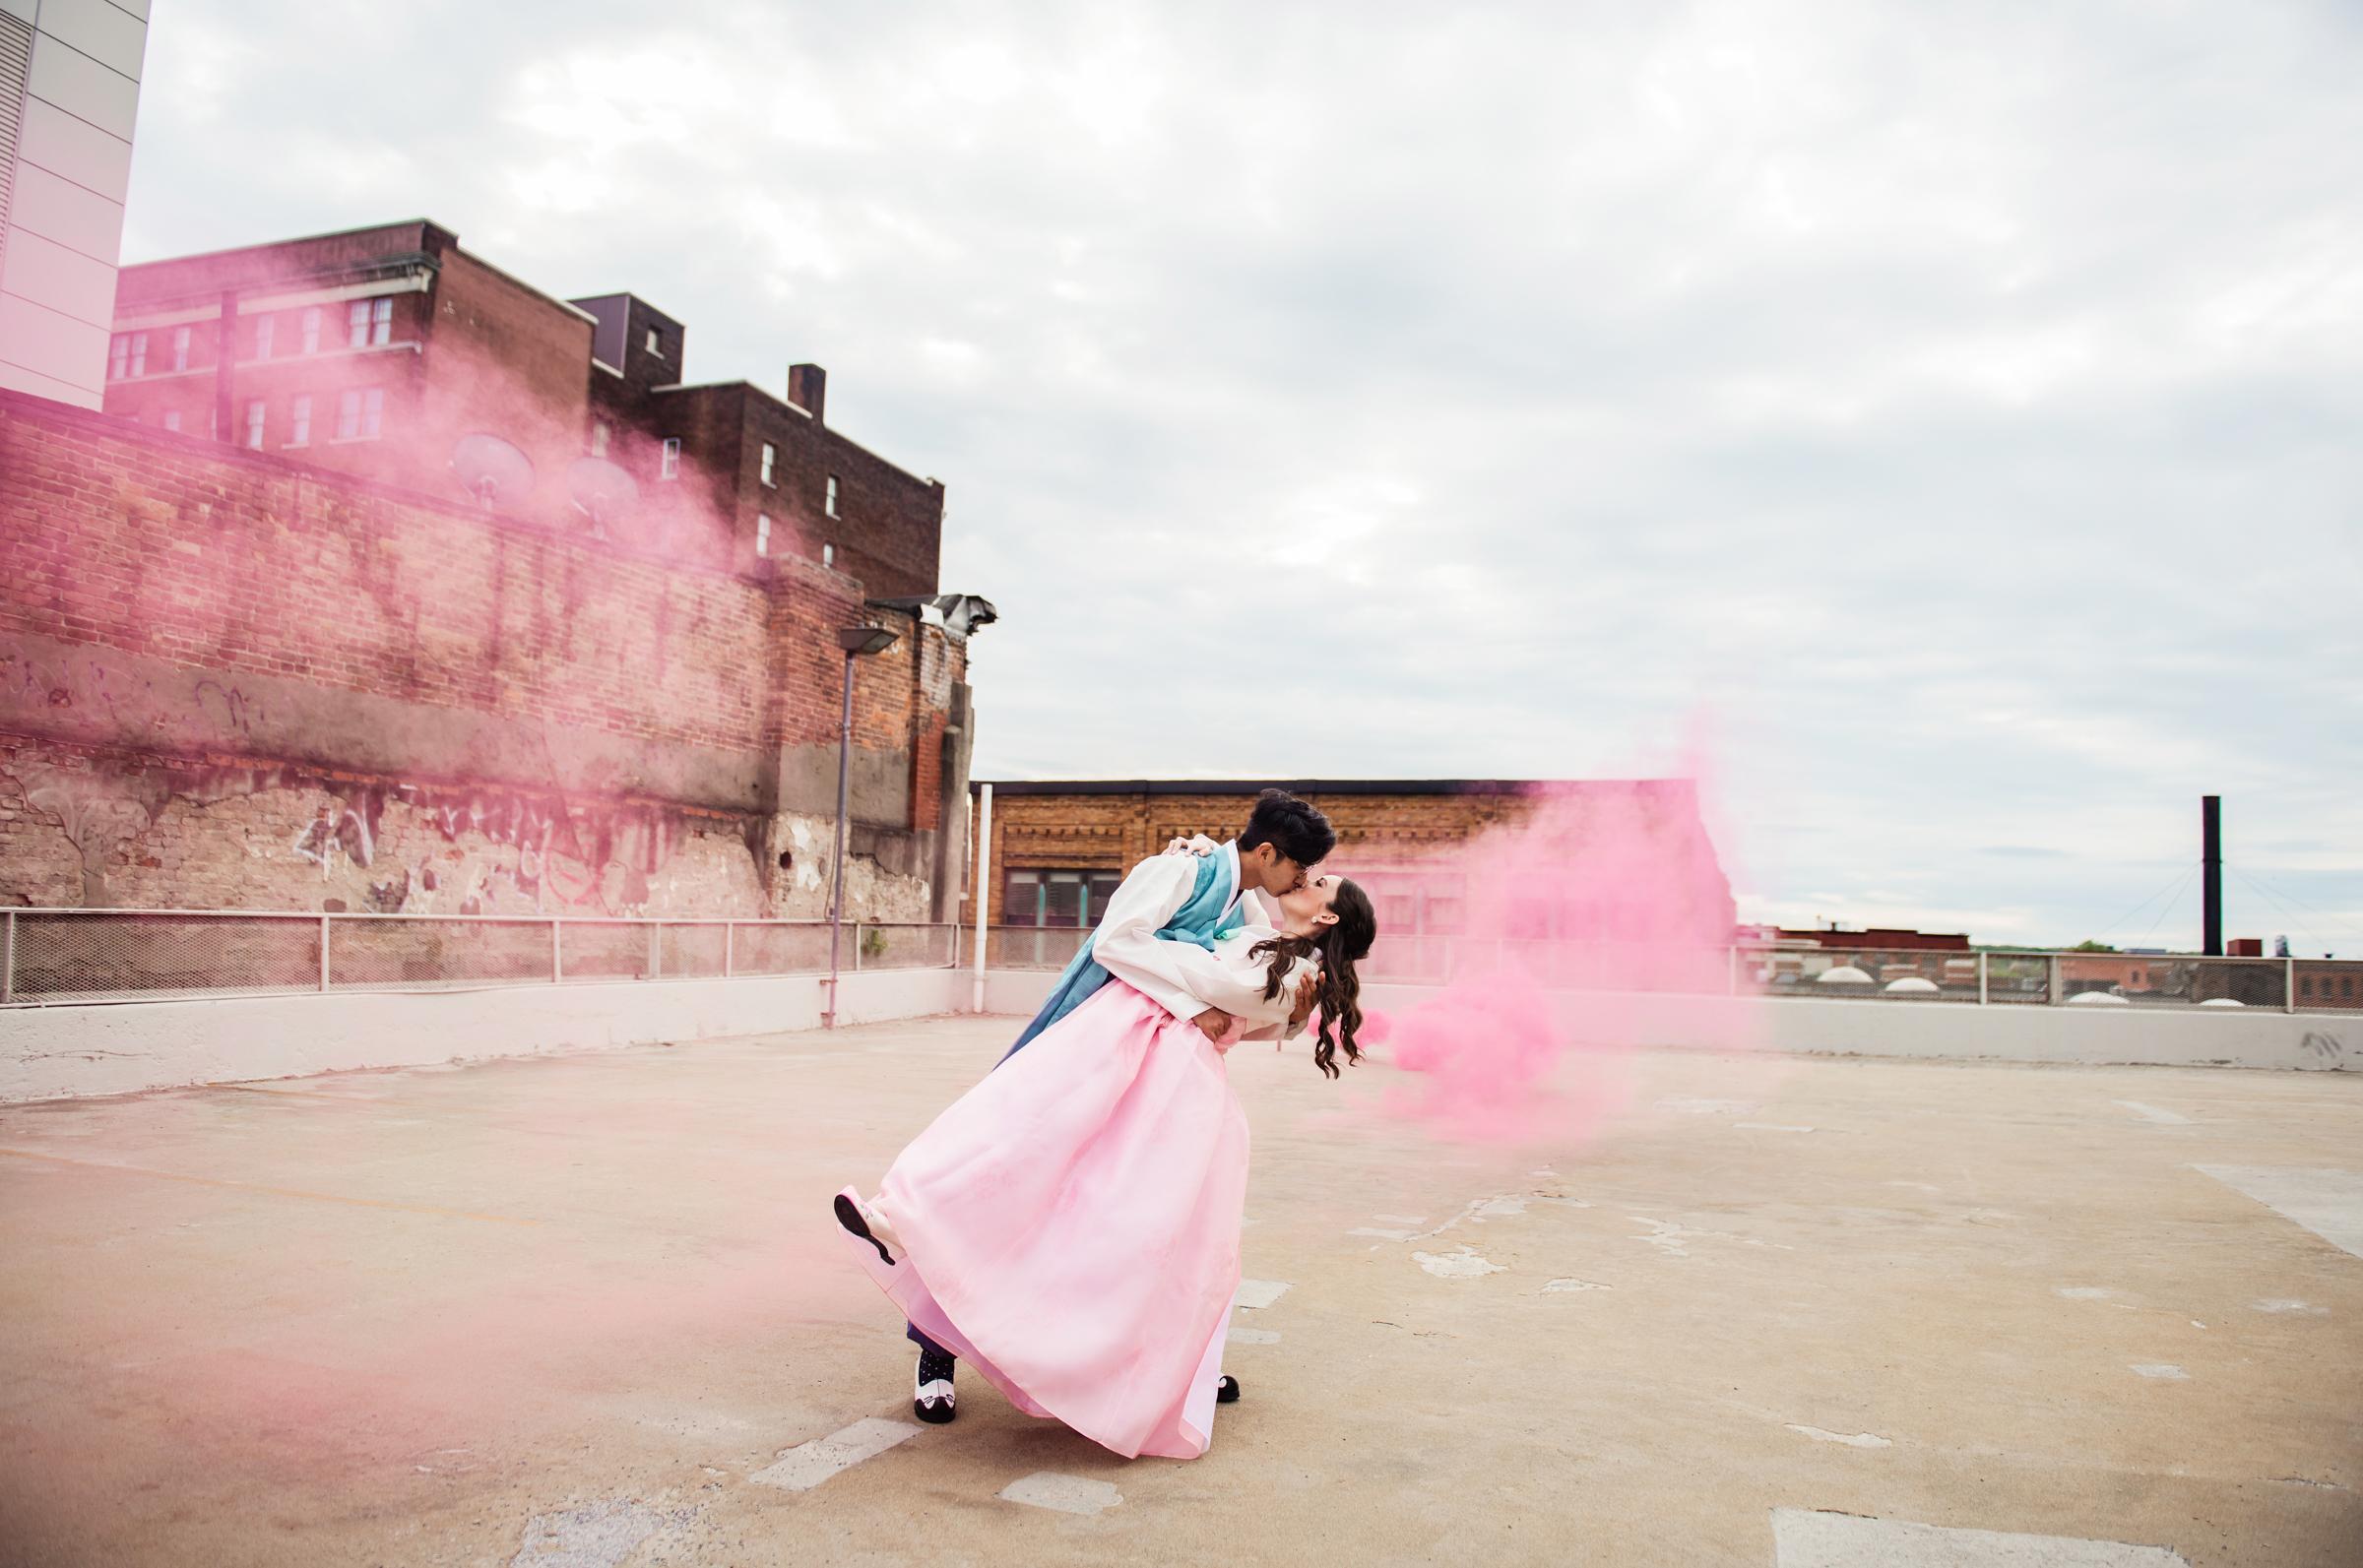 SKY_Armory_Syracuse_Wedding_JILL_STUDIO_Rochester_NY_Photographer_DSC_5666.jpg